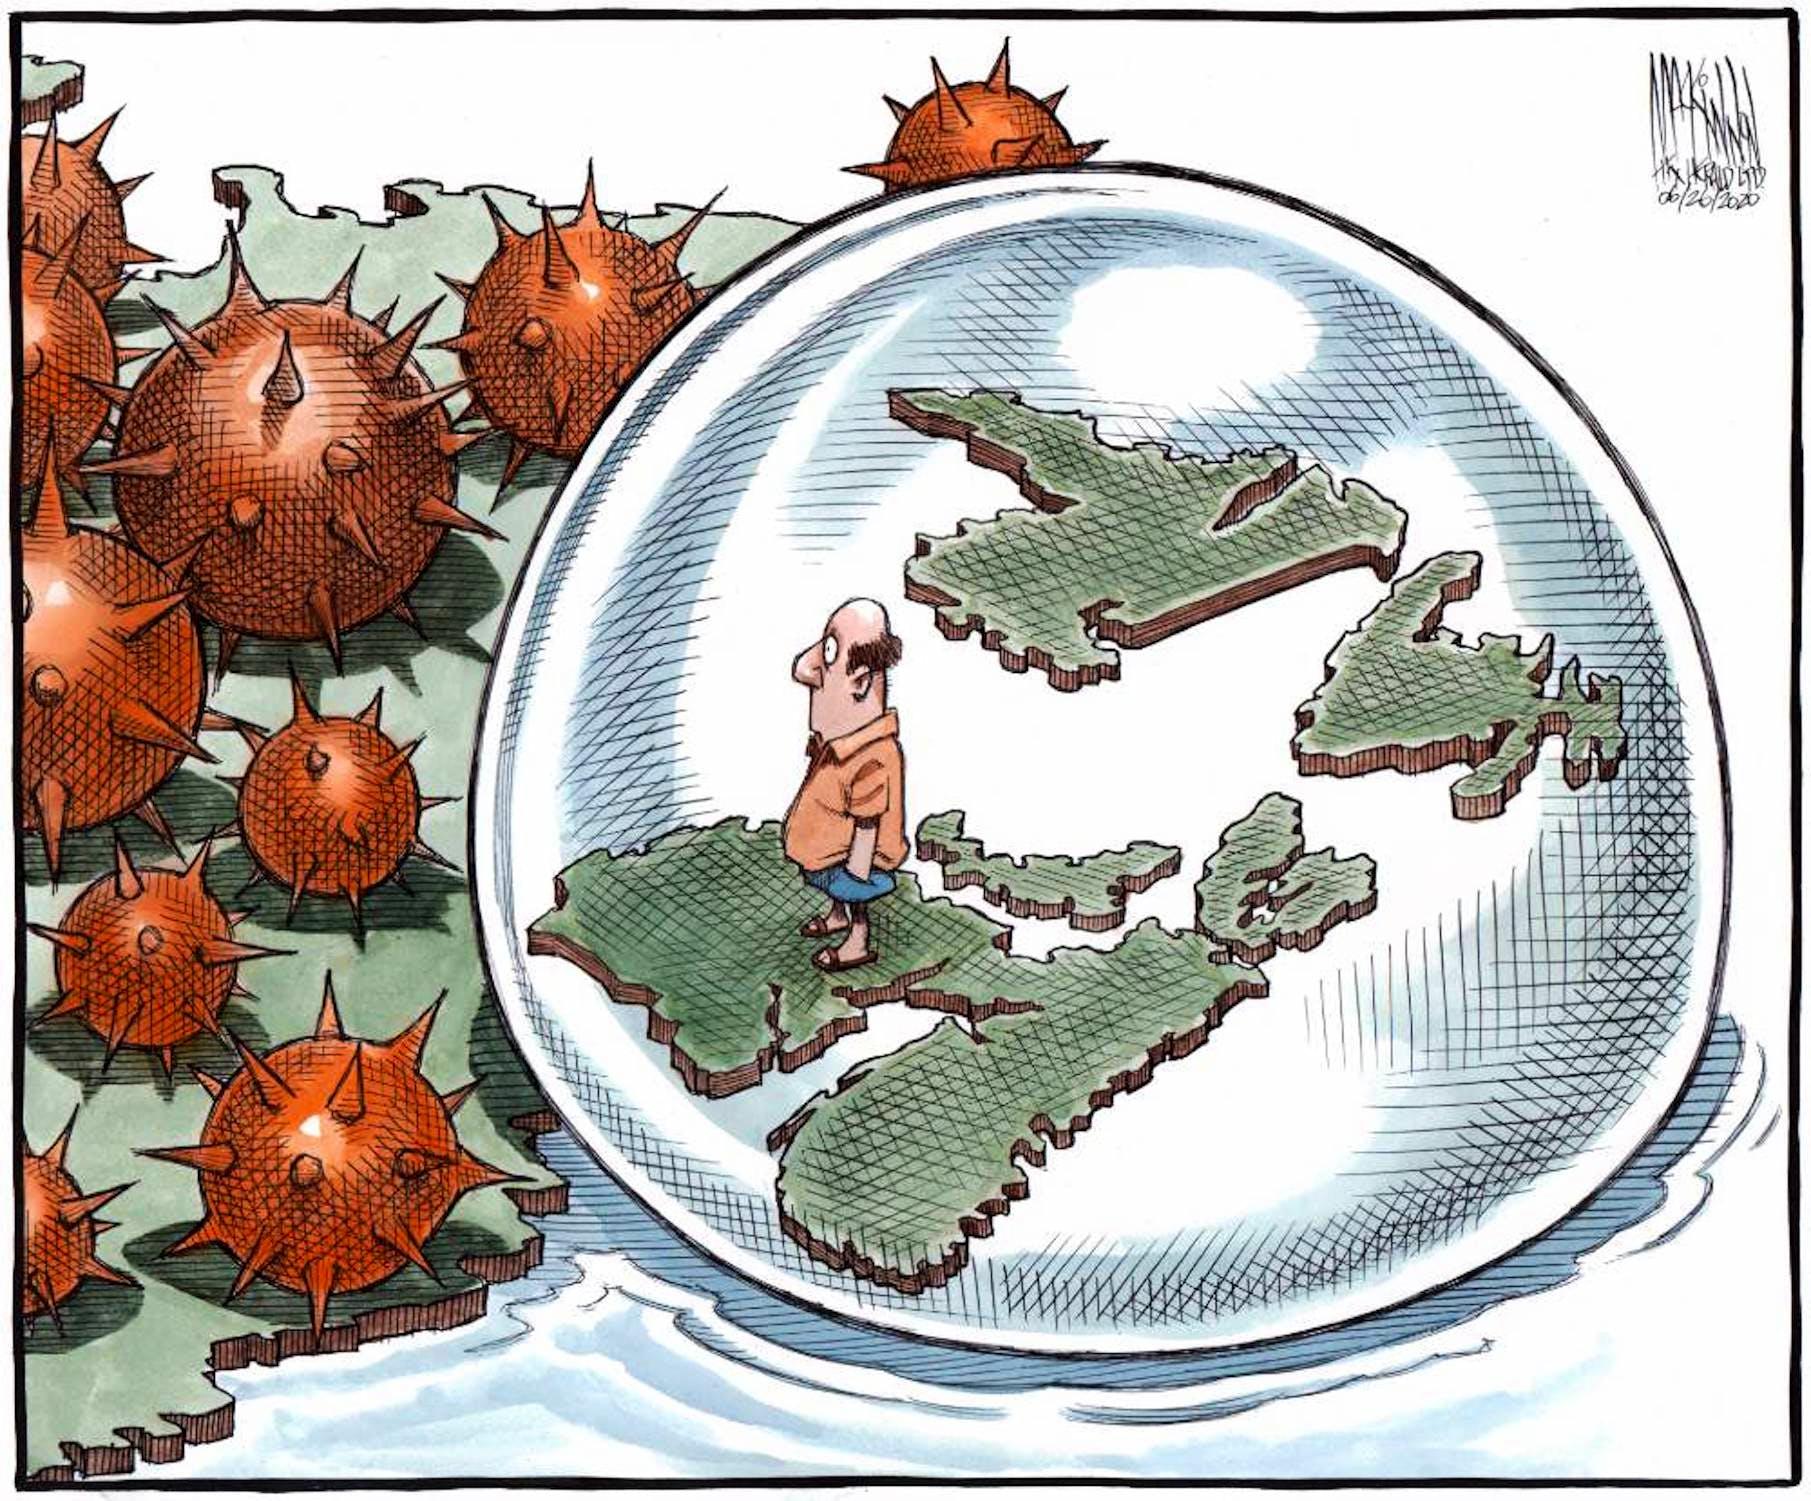 SaltWire Network cartoonist Bruce MacKinnon's June 26 cartoon on the Atlantic bubble.